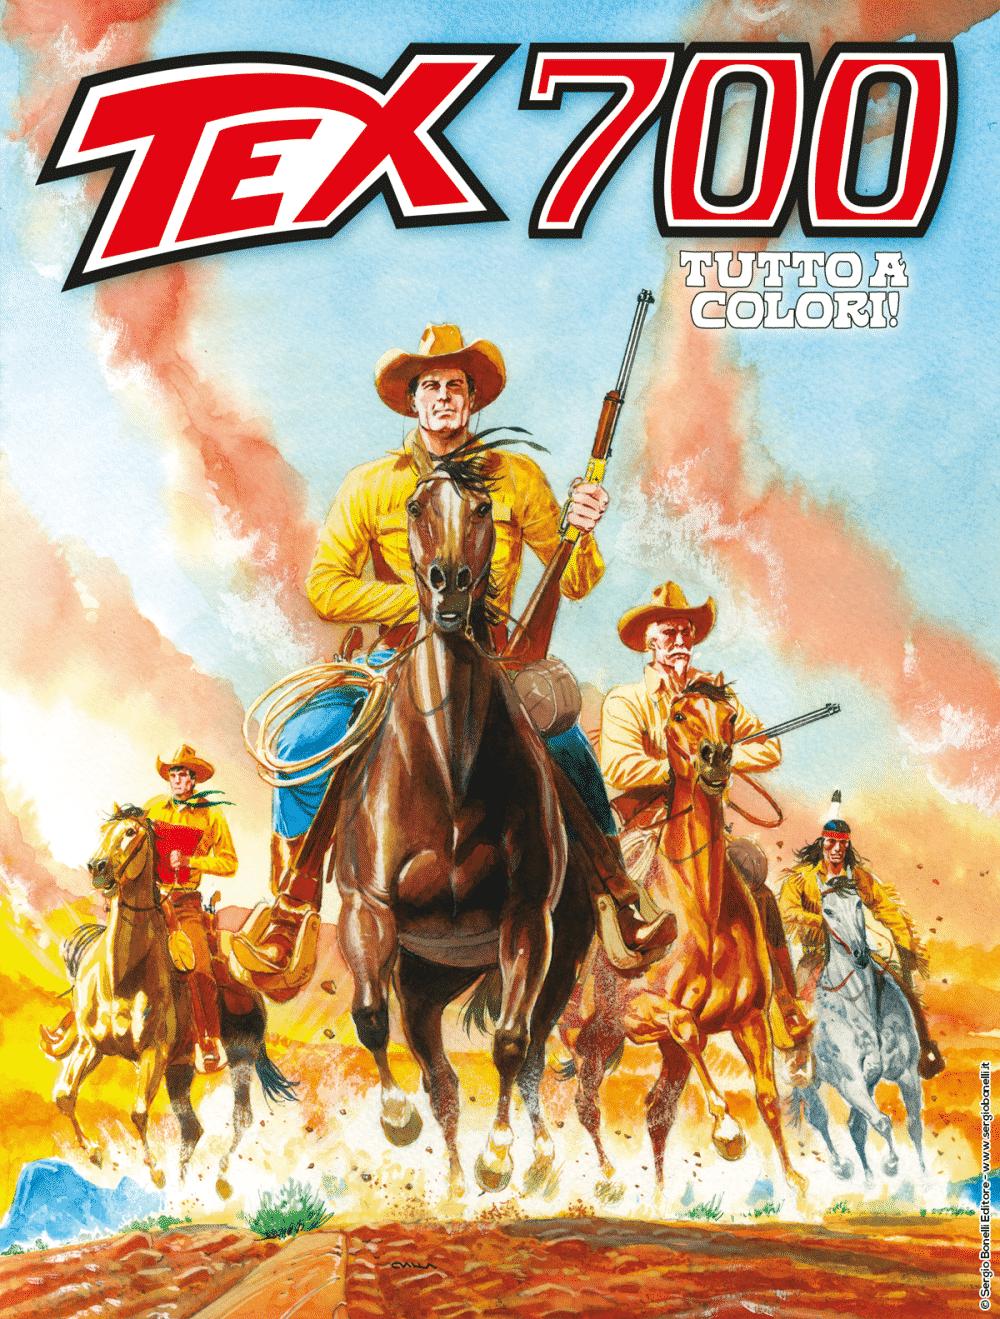 Anteprima: Tex #700 – L'oro dei Pawnee (Boselli, Civitelli)